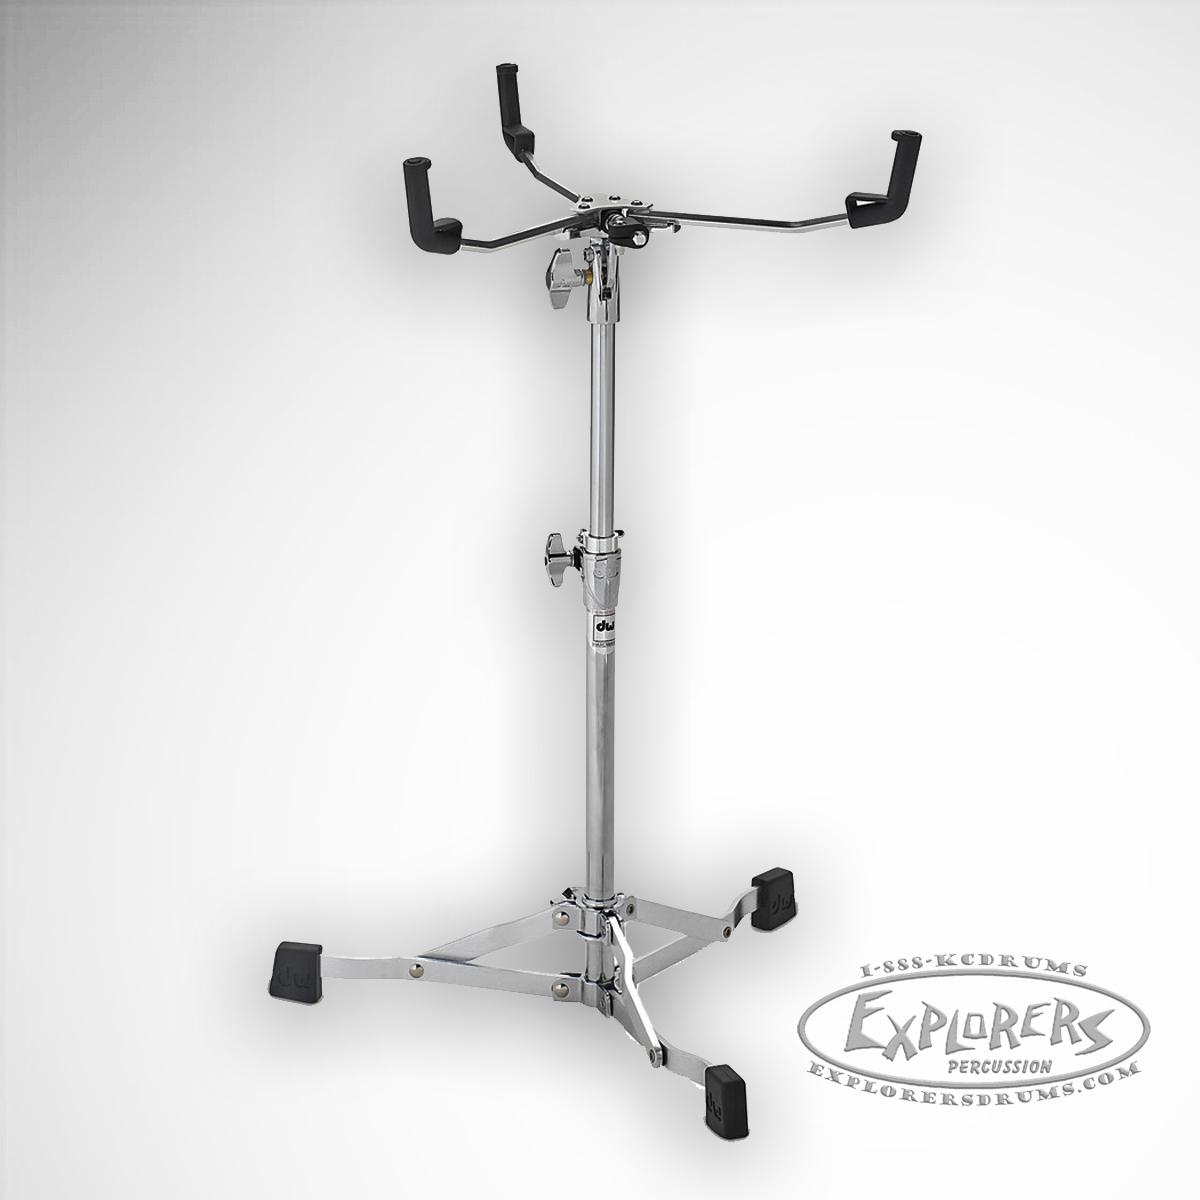 dw retro 6300ul ultra light flat based snare drum stand. Black Bedroom Furniture Sets. Home Design Ideas